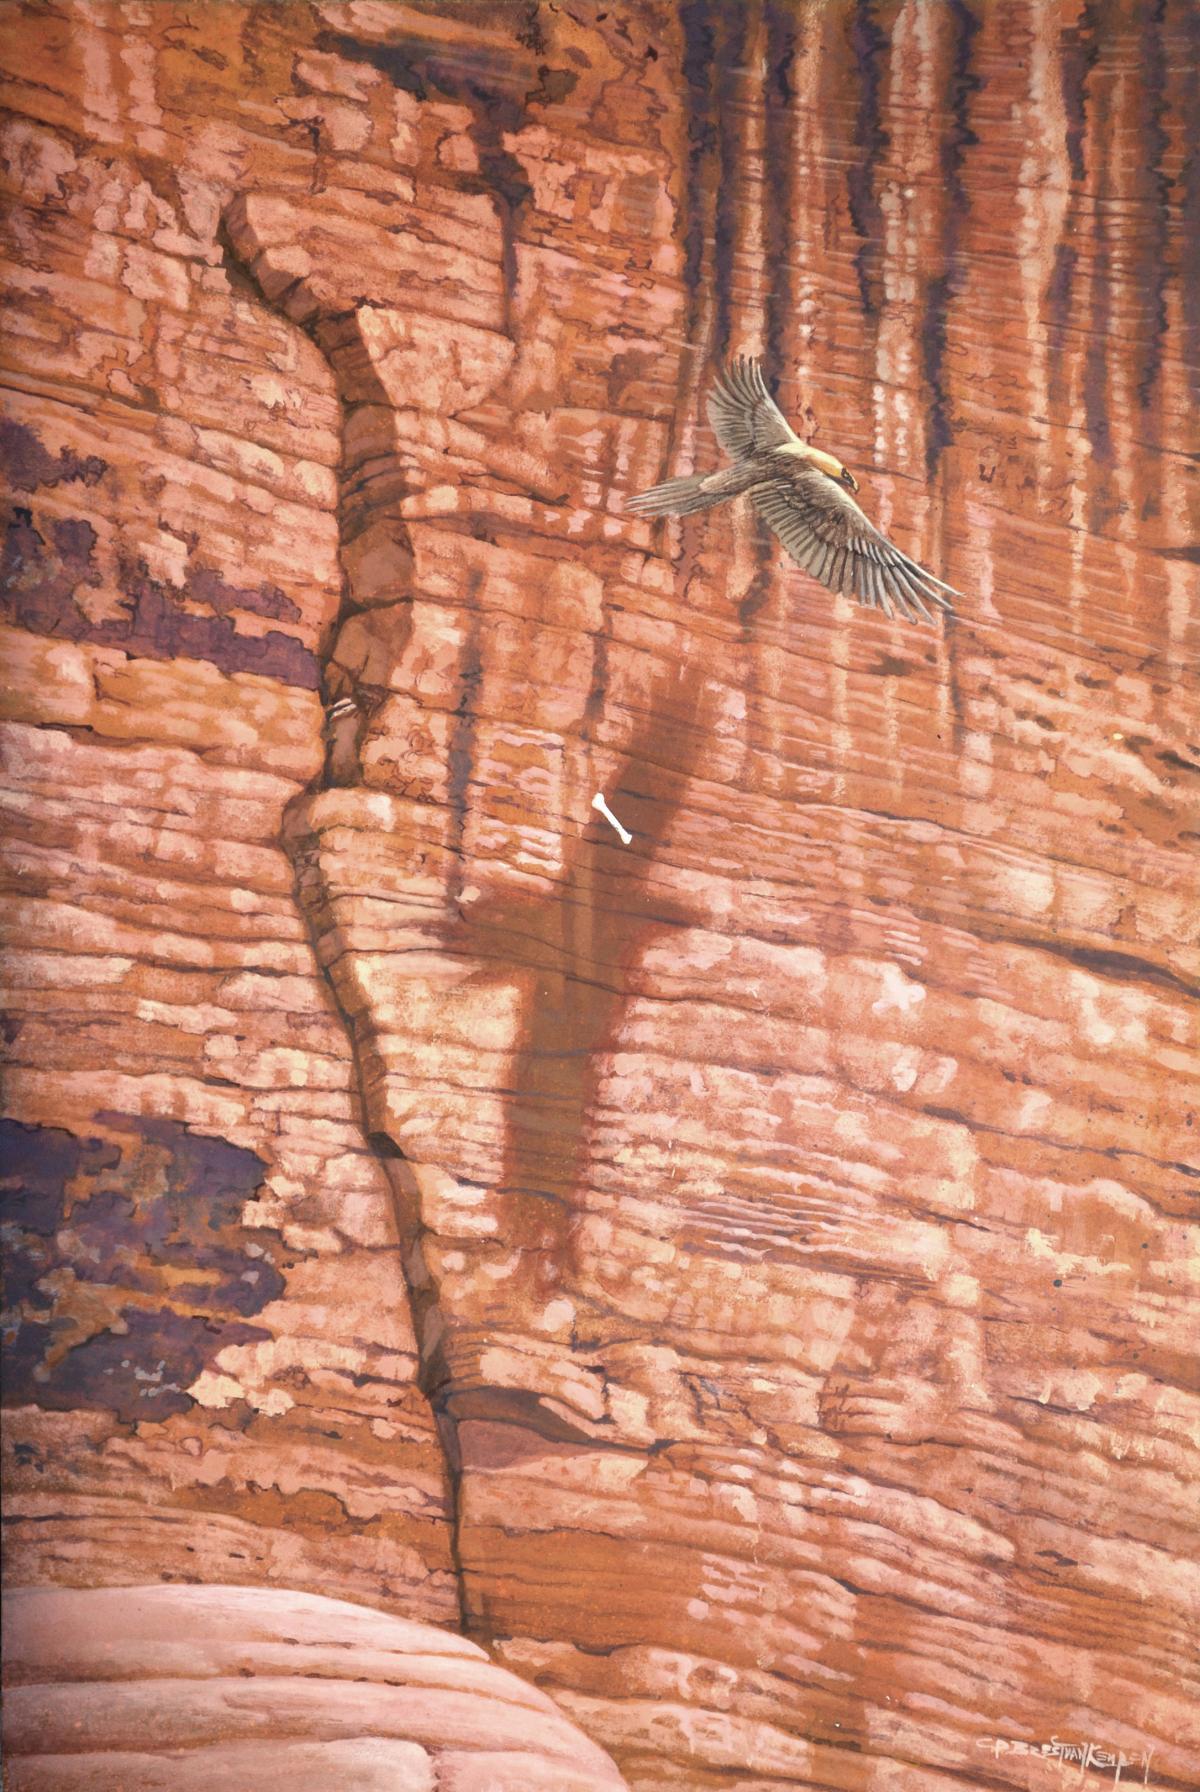 Ossifrage   Wallhanging by Carel Brest van Kempen   Artists for Conservation 2021